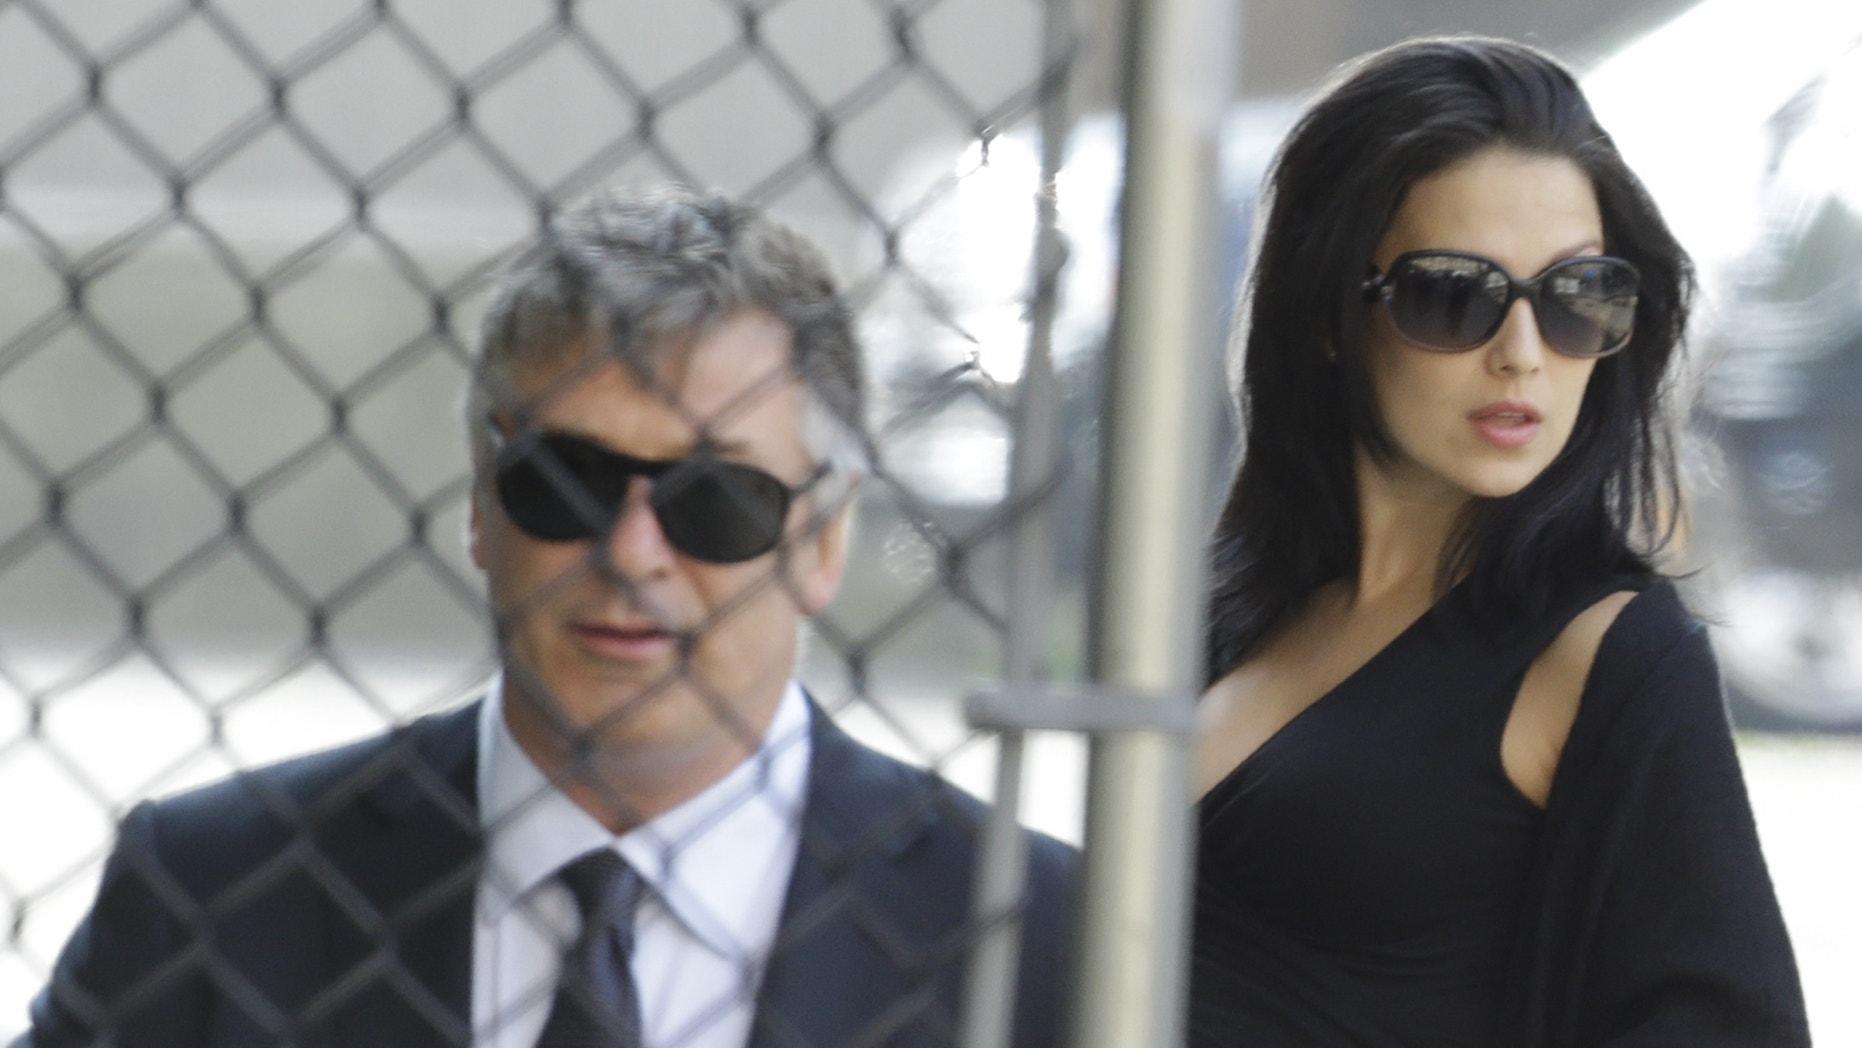 Alec Baldwin and wife Hilaria Thomas at James Gandolfini's funeral on June 27, 2013.